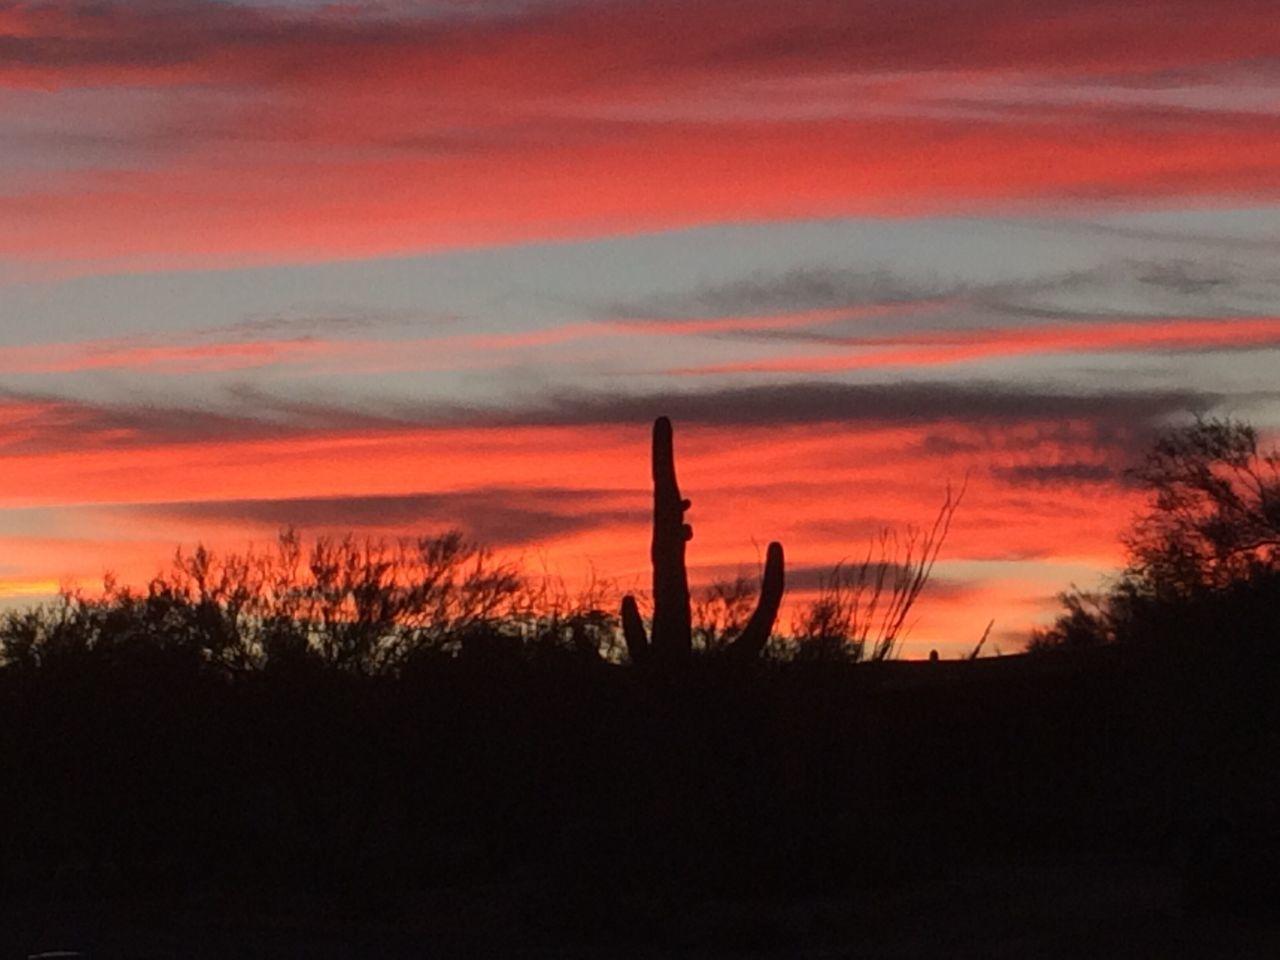 Desert Sunrise Nature Tranquility Silhouette No People Cactus Sunrise Dramatic Sky Orange Color Majestic Non Urban Scene